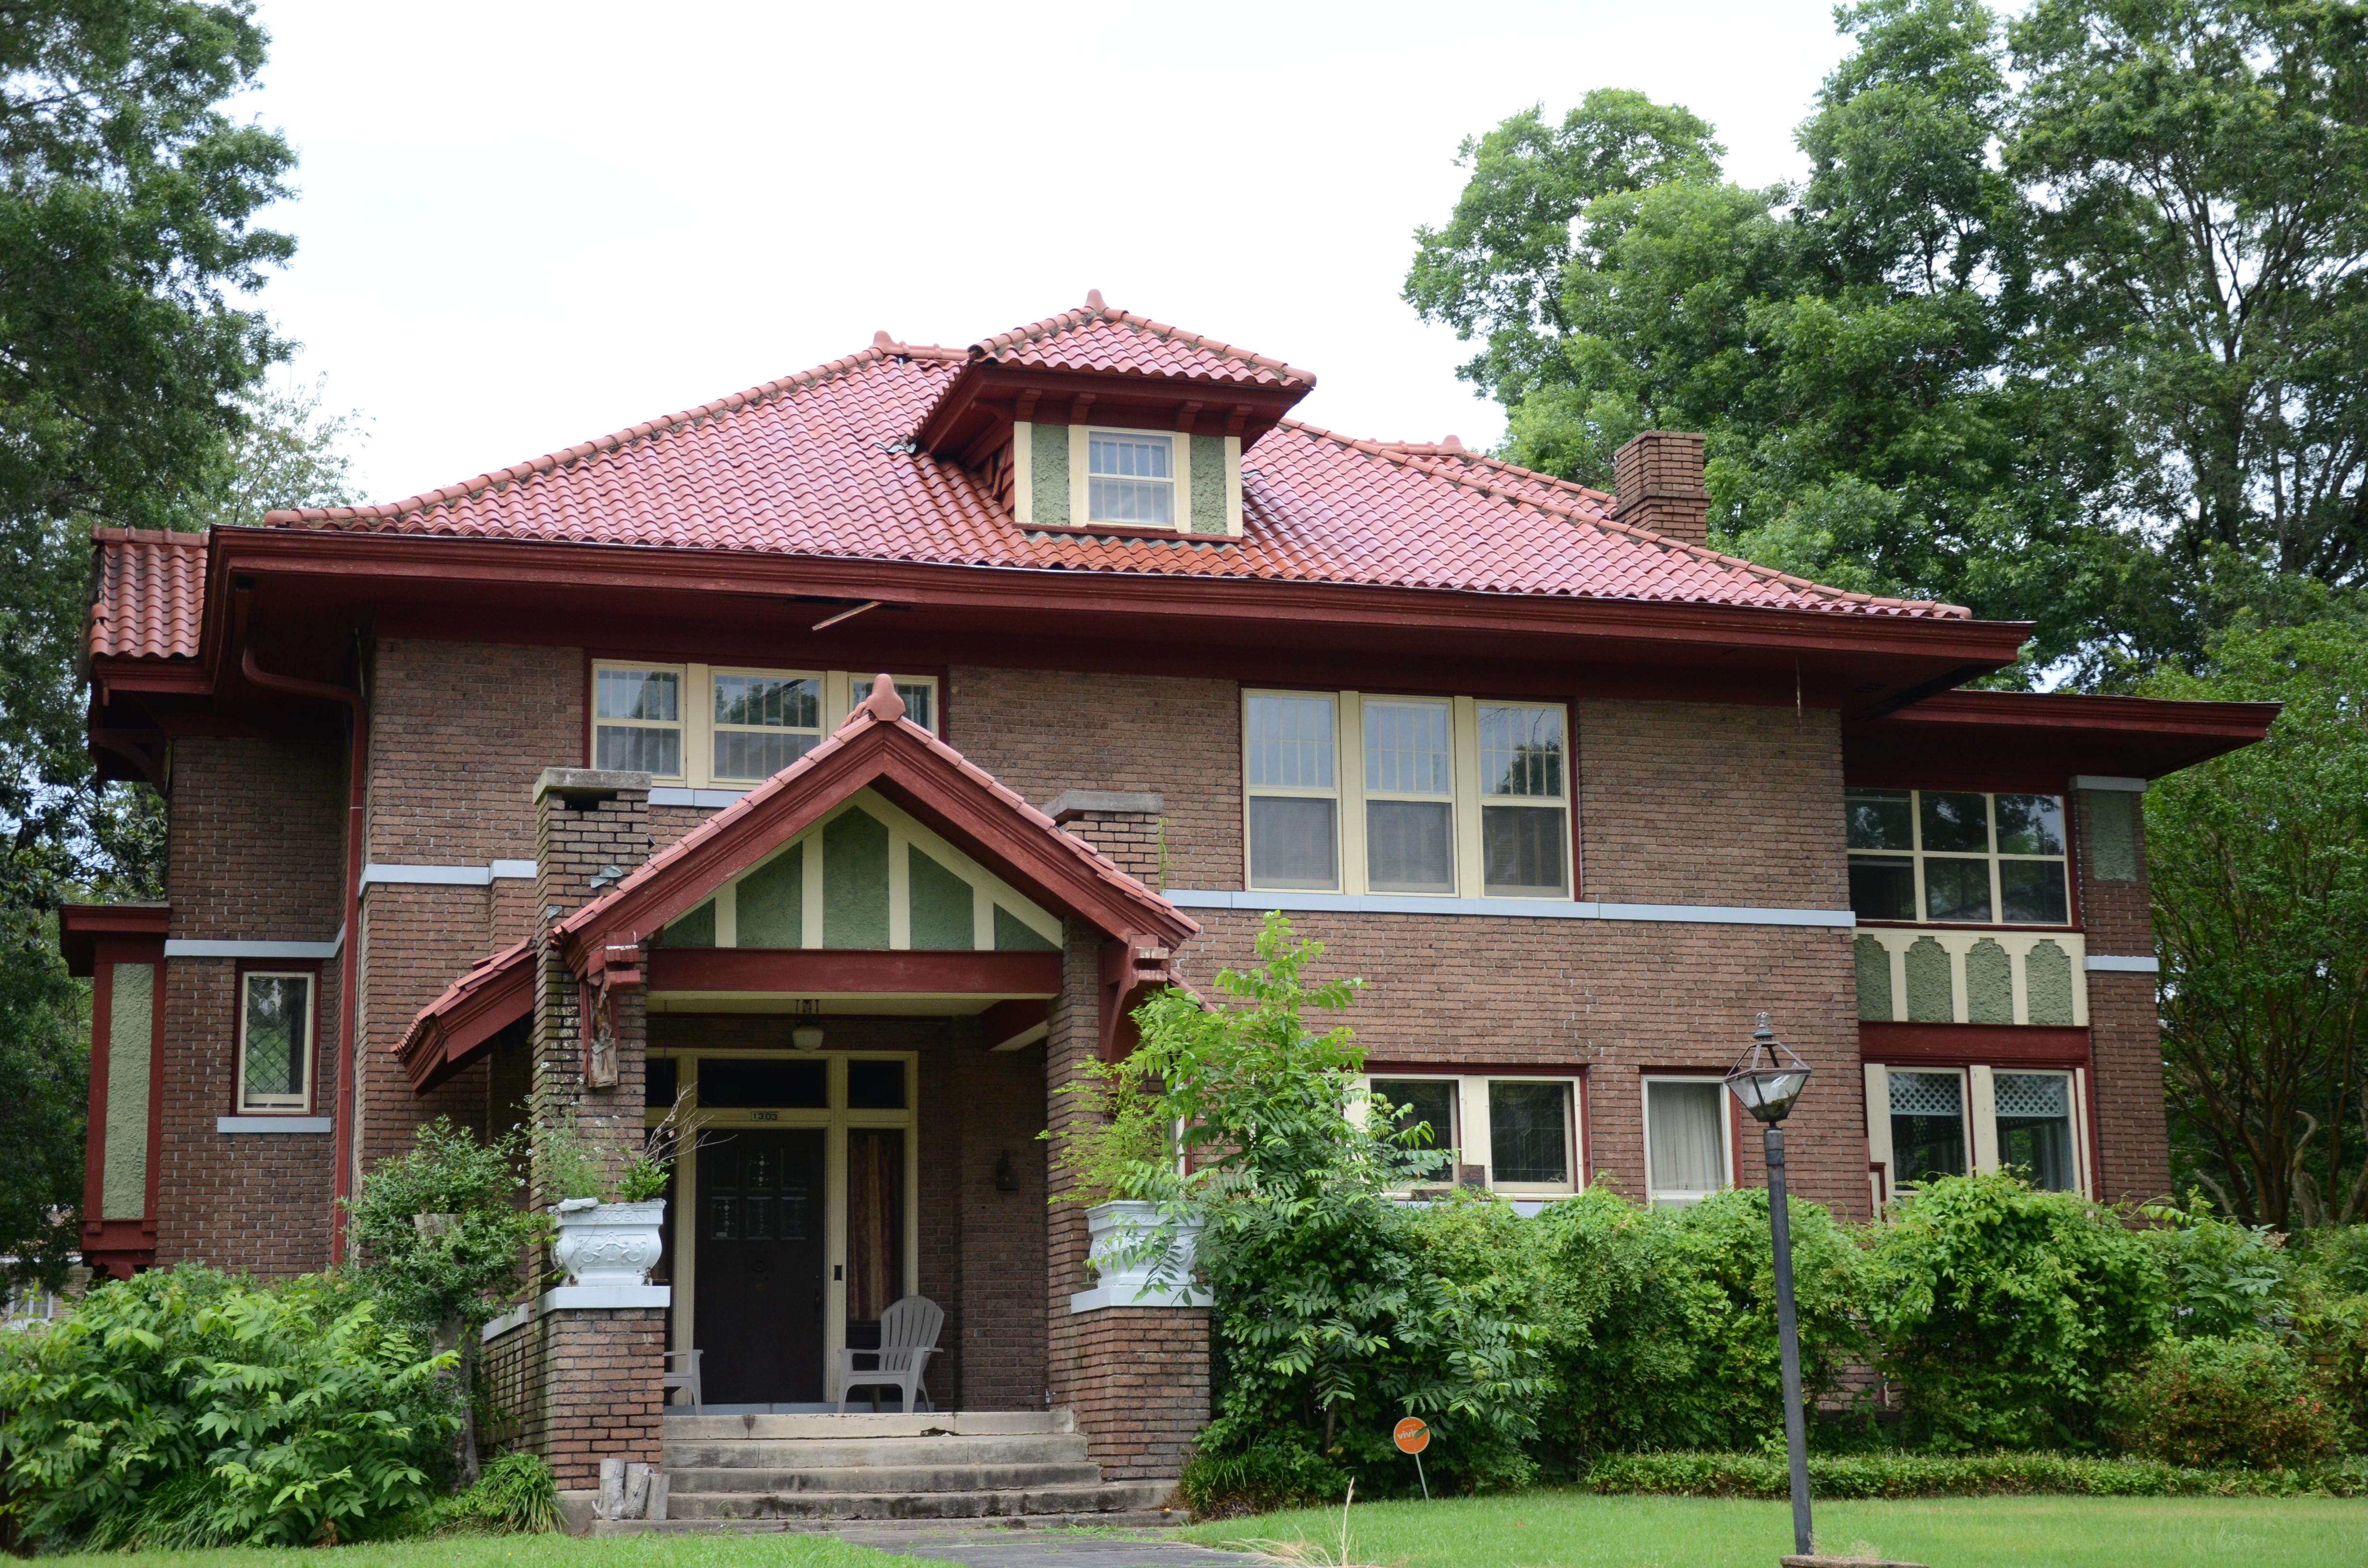 Fox House Pine Bluff Arkansas Wikipedia